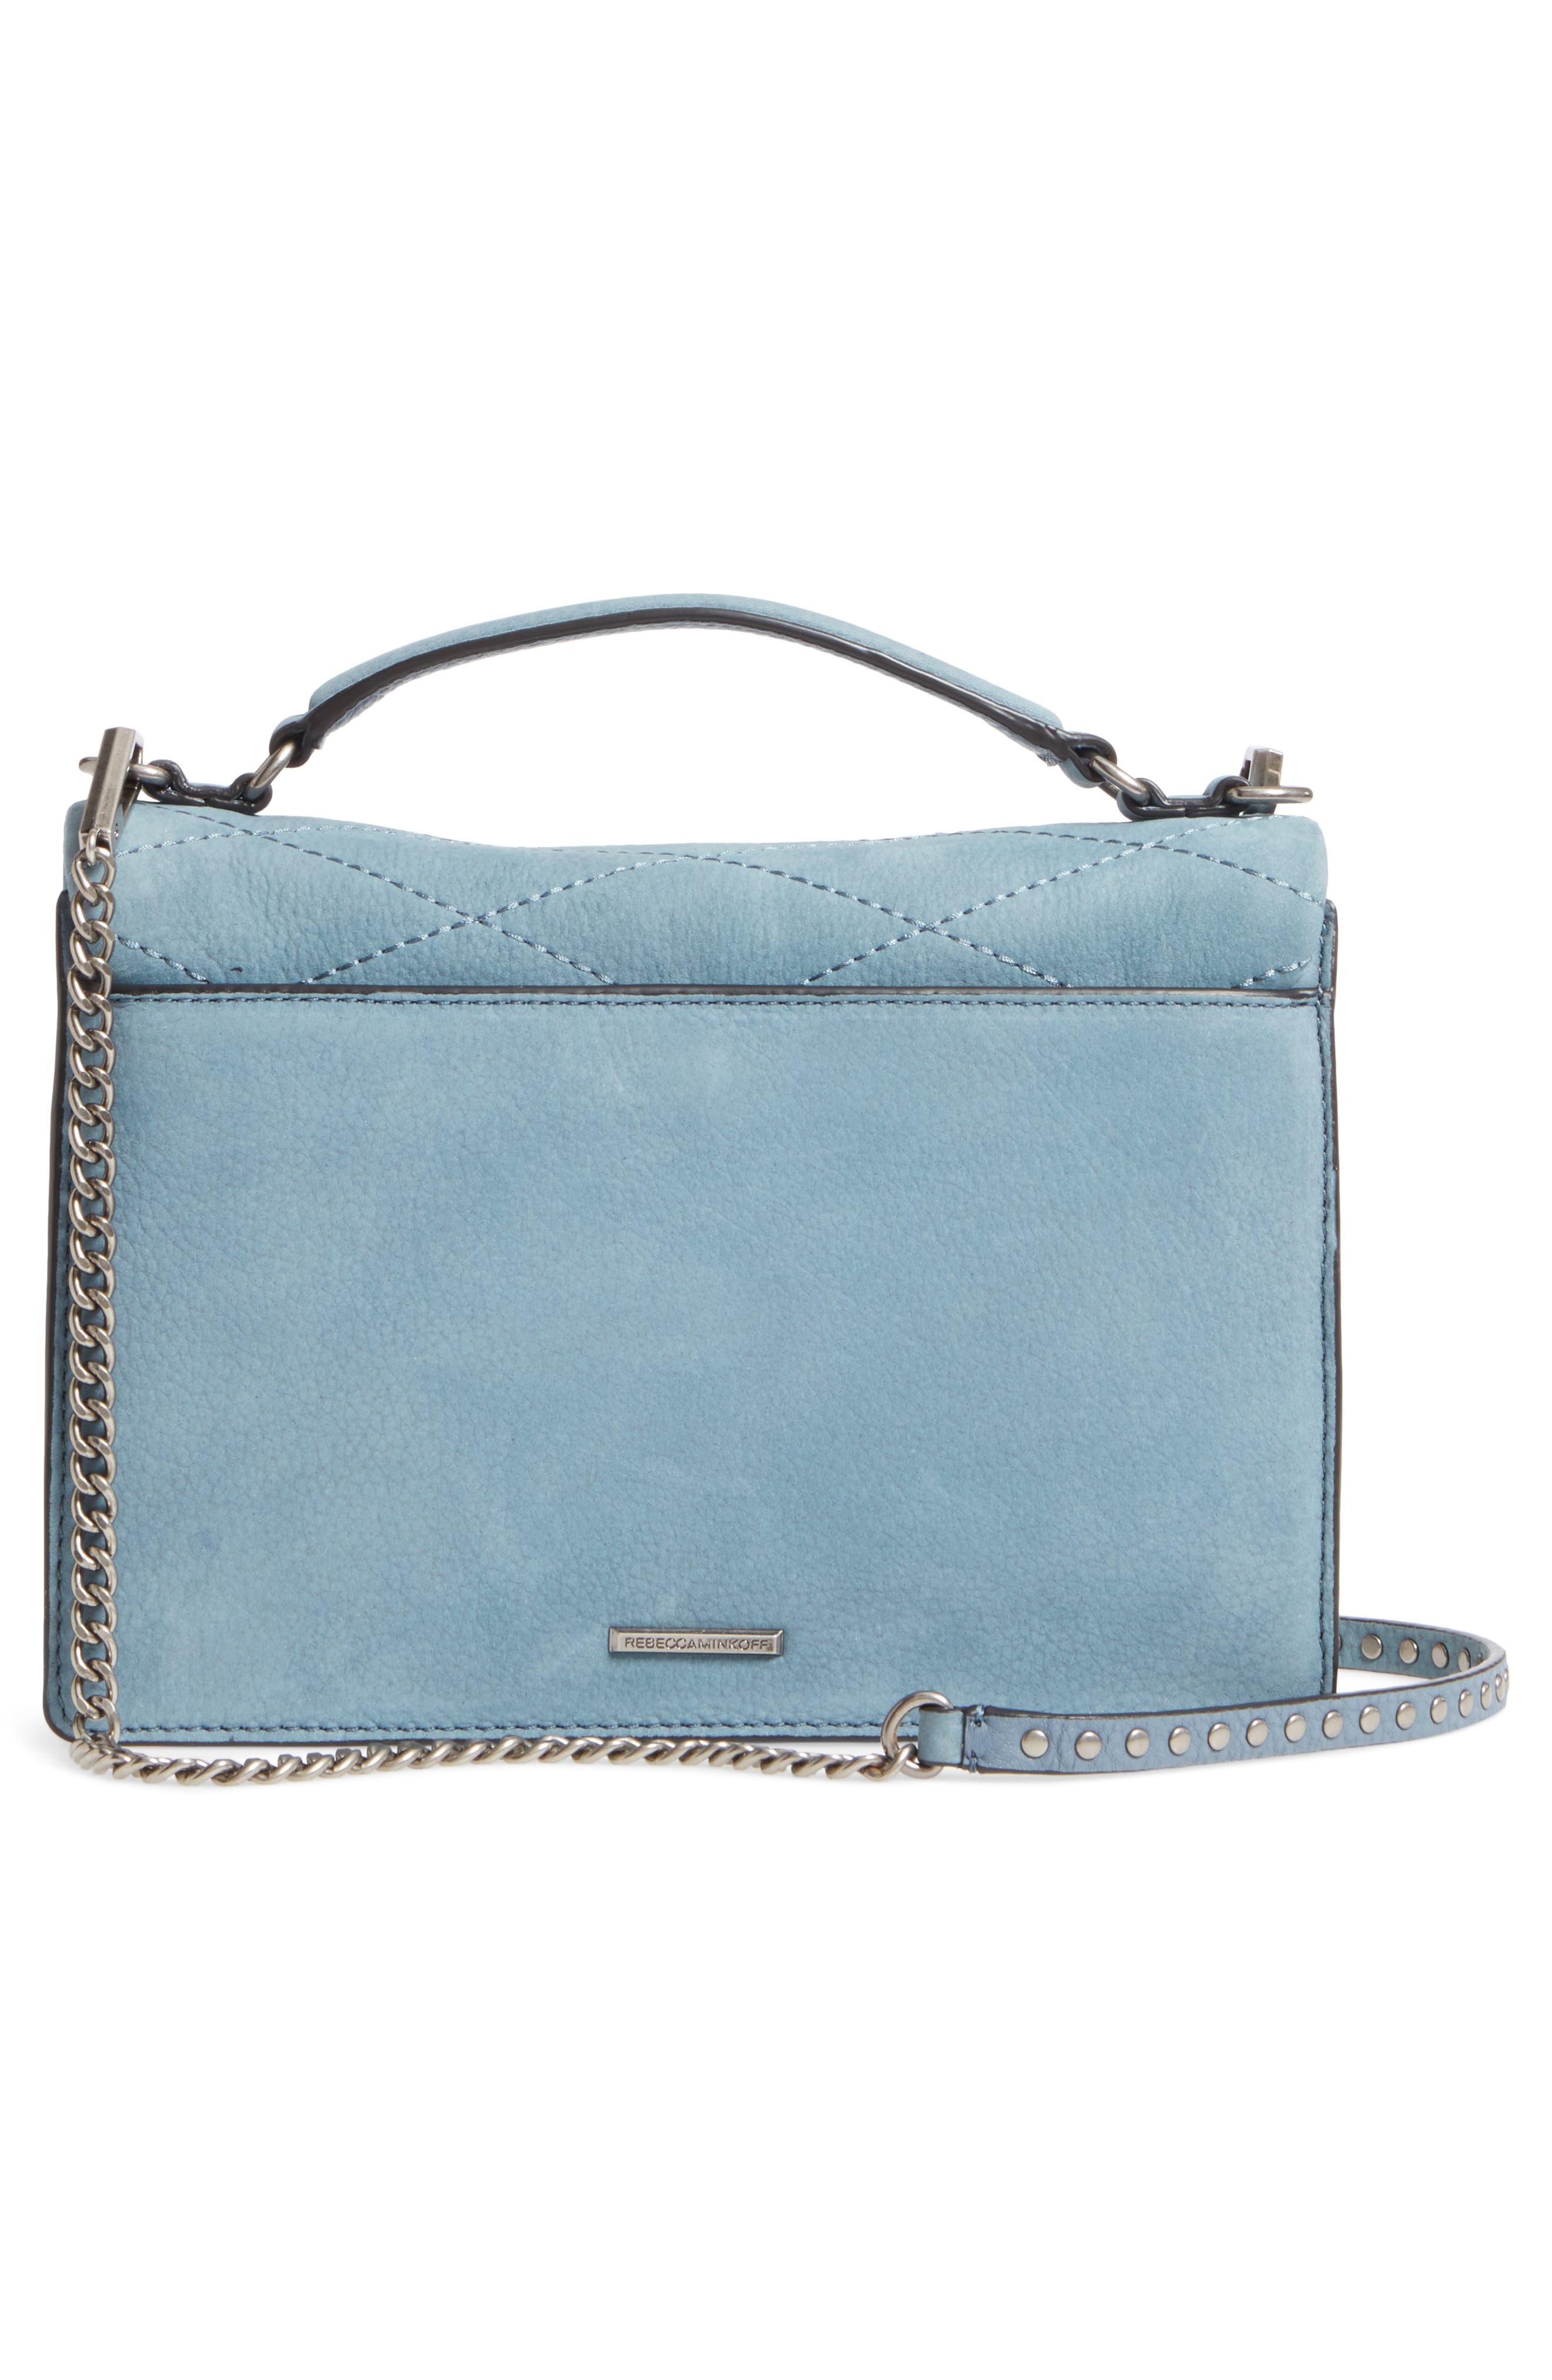 Alternate Image 3  - Rebecca Minkoff Medium Je T'aime Convertible Leather Crossbody Bag